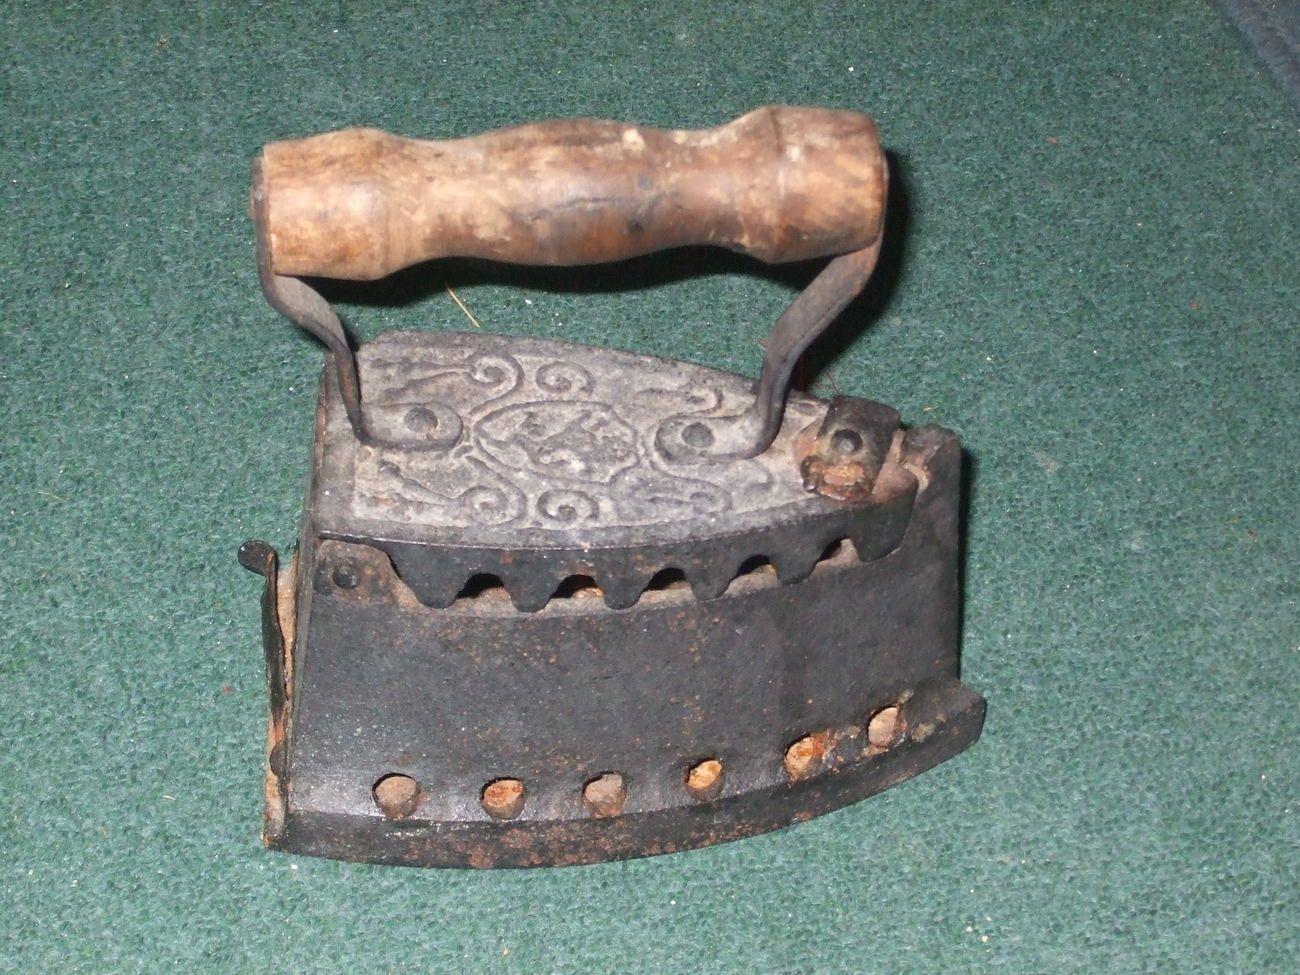 Vintage Coal Clothes Iron Wood Handle